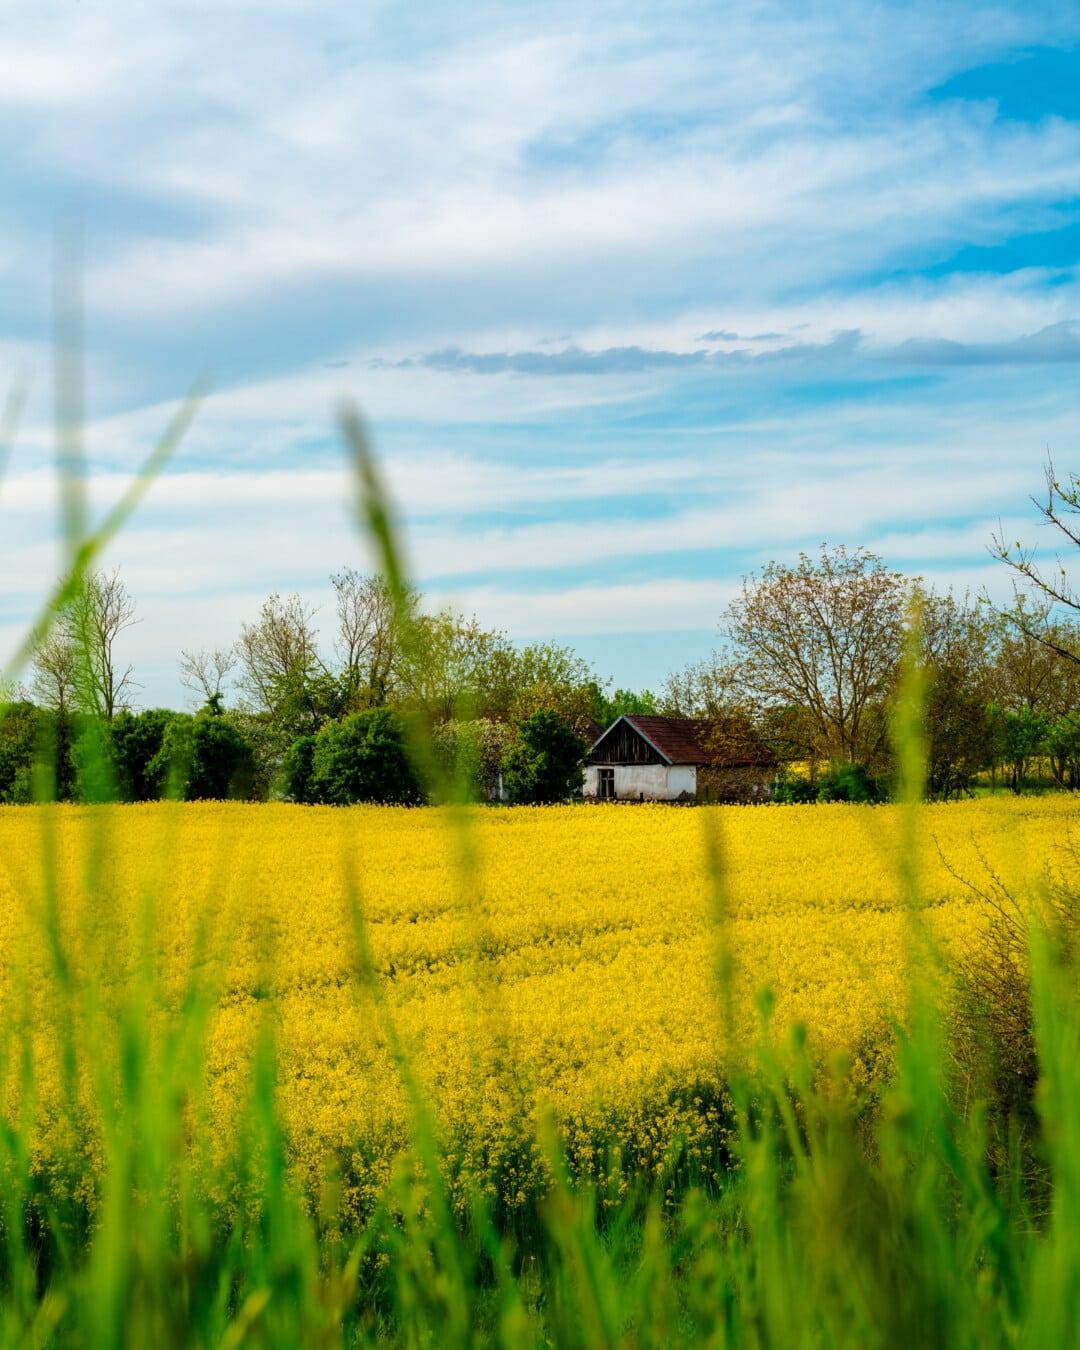 ranch, farmhouse, farmland, rapeseed, agriculture, plant, meadow, farm, landscape, rural